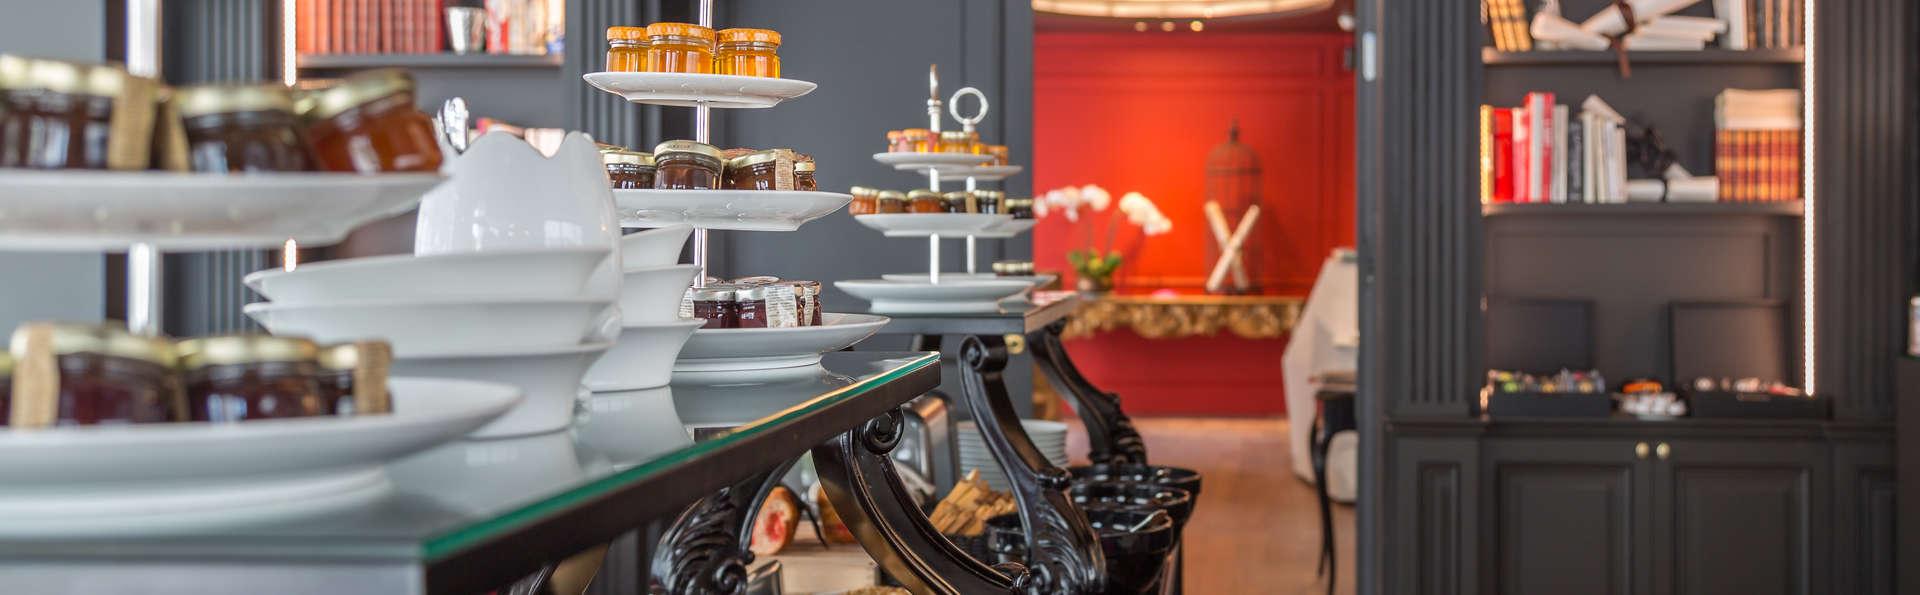 Hôtel La Comtesse by Elegancia - CAFE_LA_COMTESSE_-_PETIT_DEJEUNER__2_.jpg